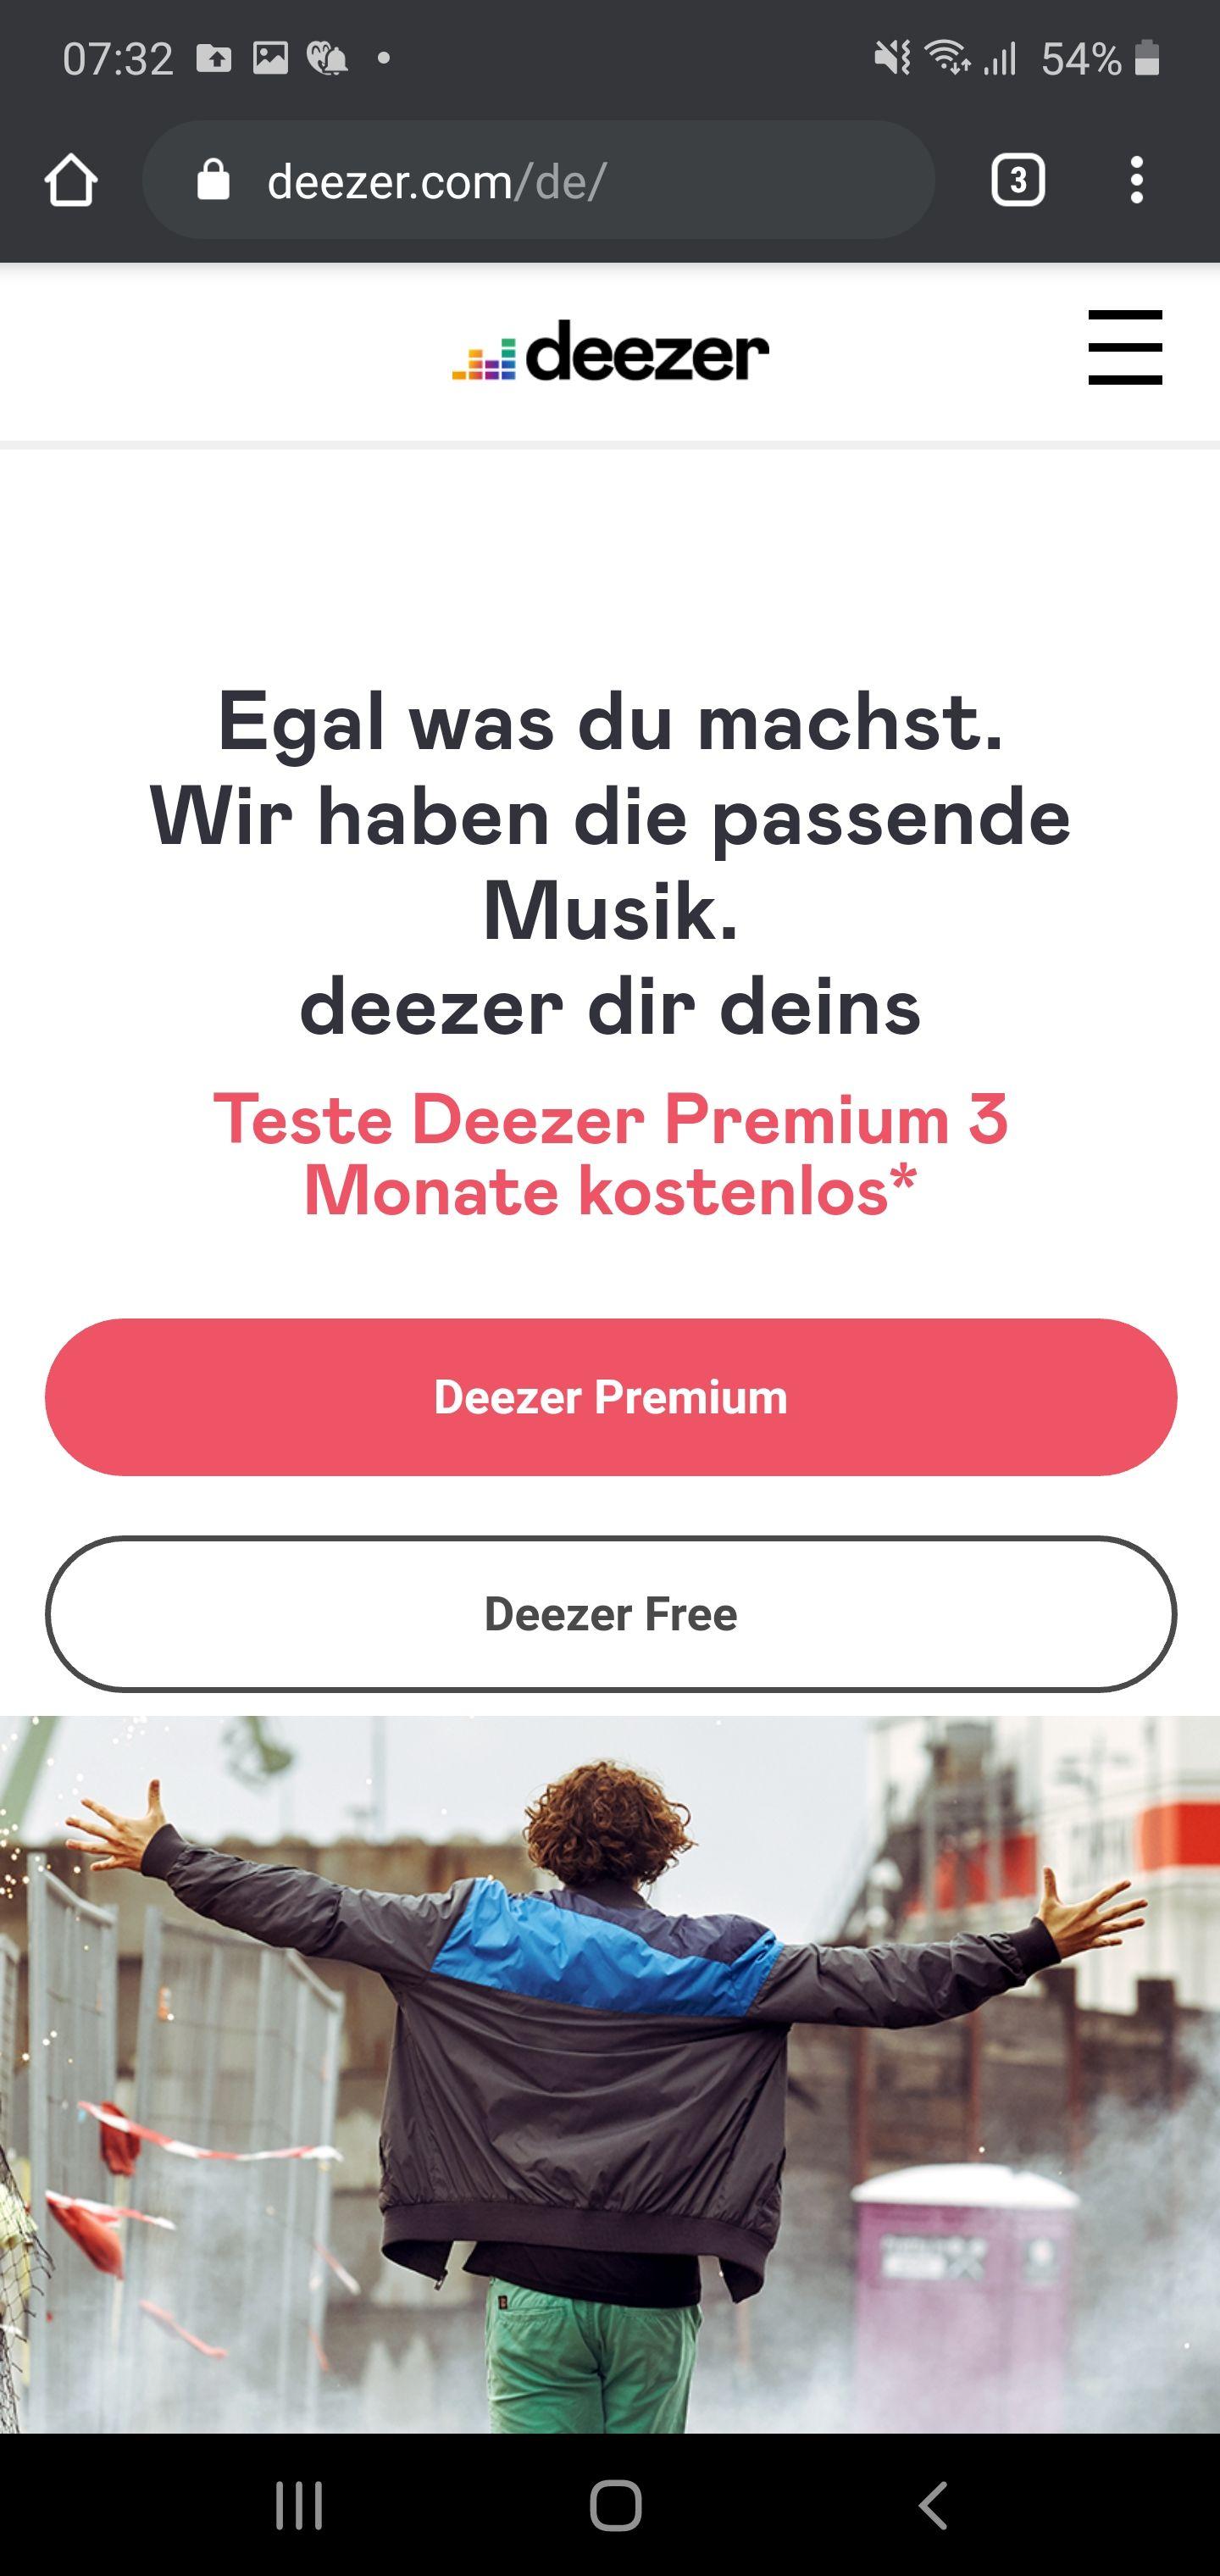 3 Monate Deezer oder 30 Tage Deezer Hifi gratis